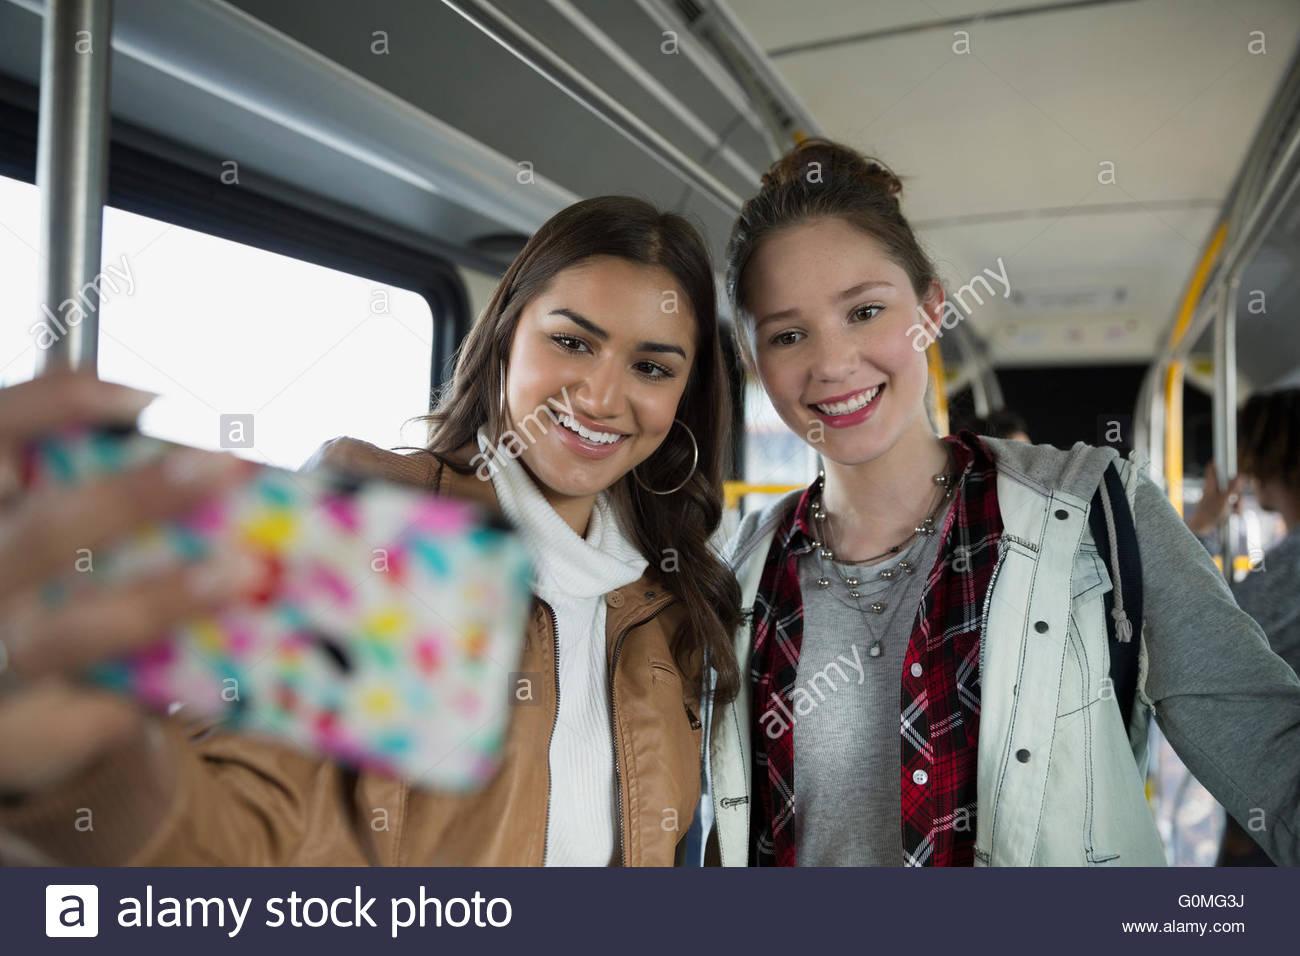 Teenage girls taking selfie cell phone on bus - Stock Image